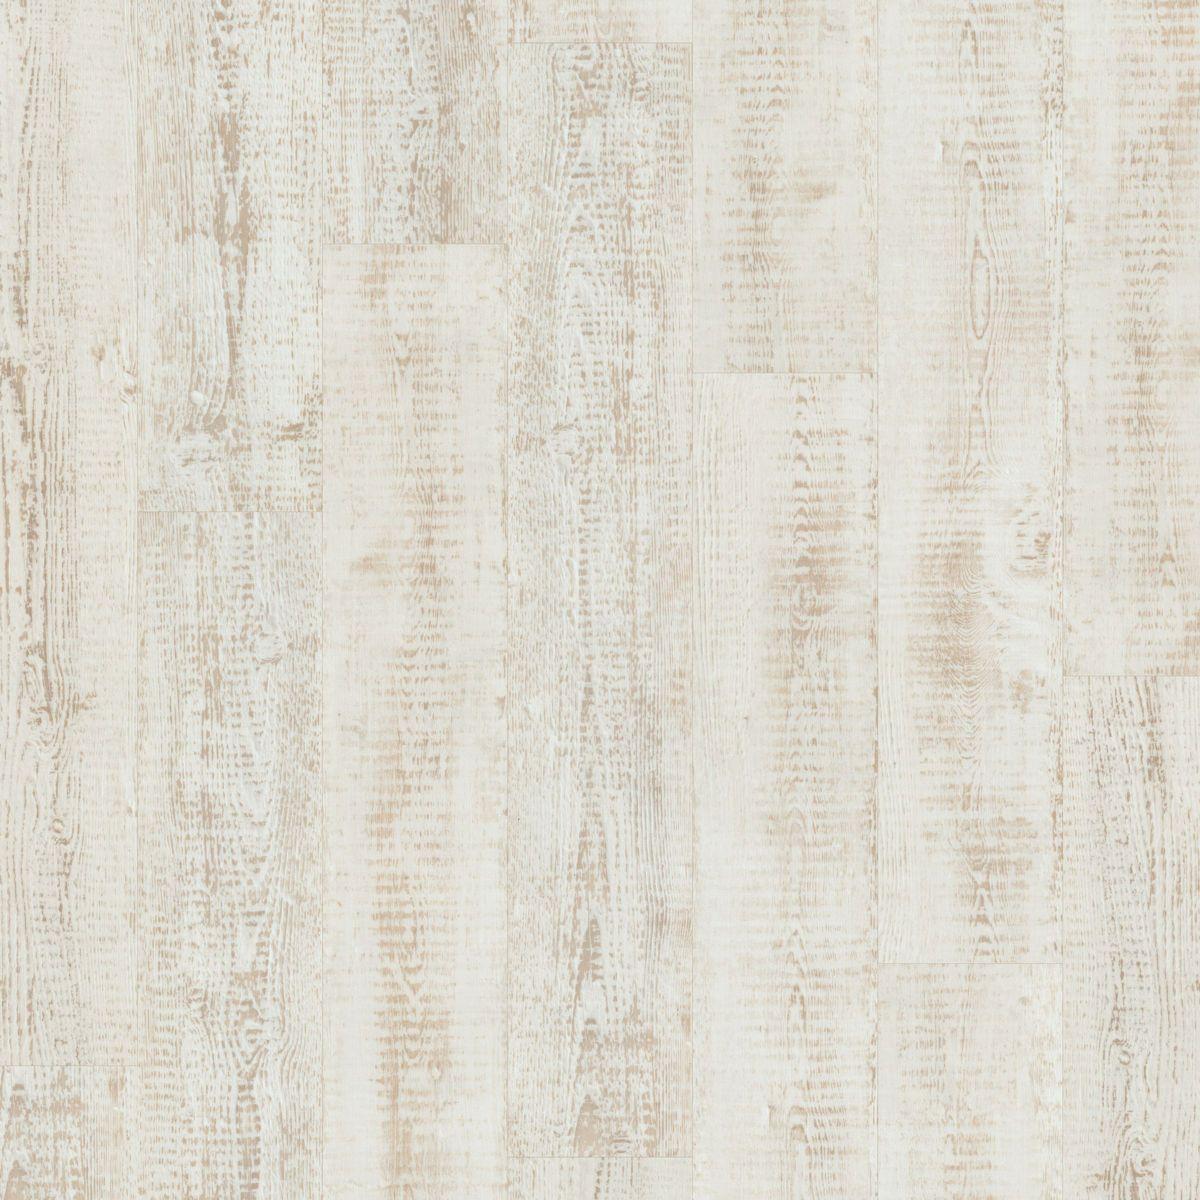 Karndean knight tile white painted oak knight white flooring karndean knight tile white painted oak kp105 vinyl flooring dailygadgetfo Images